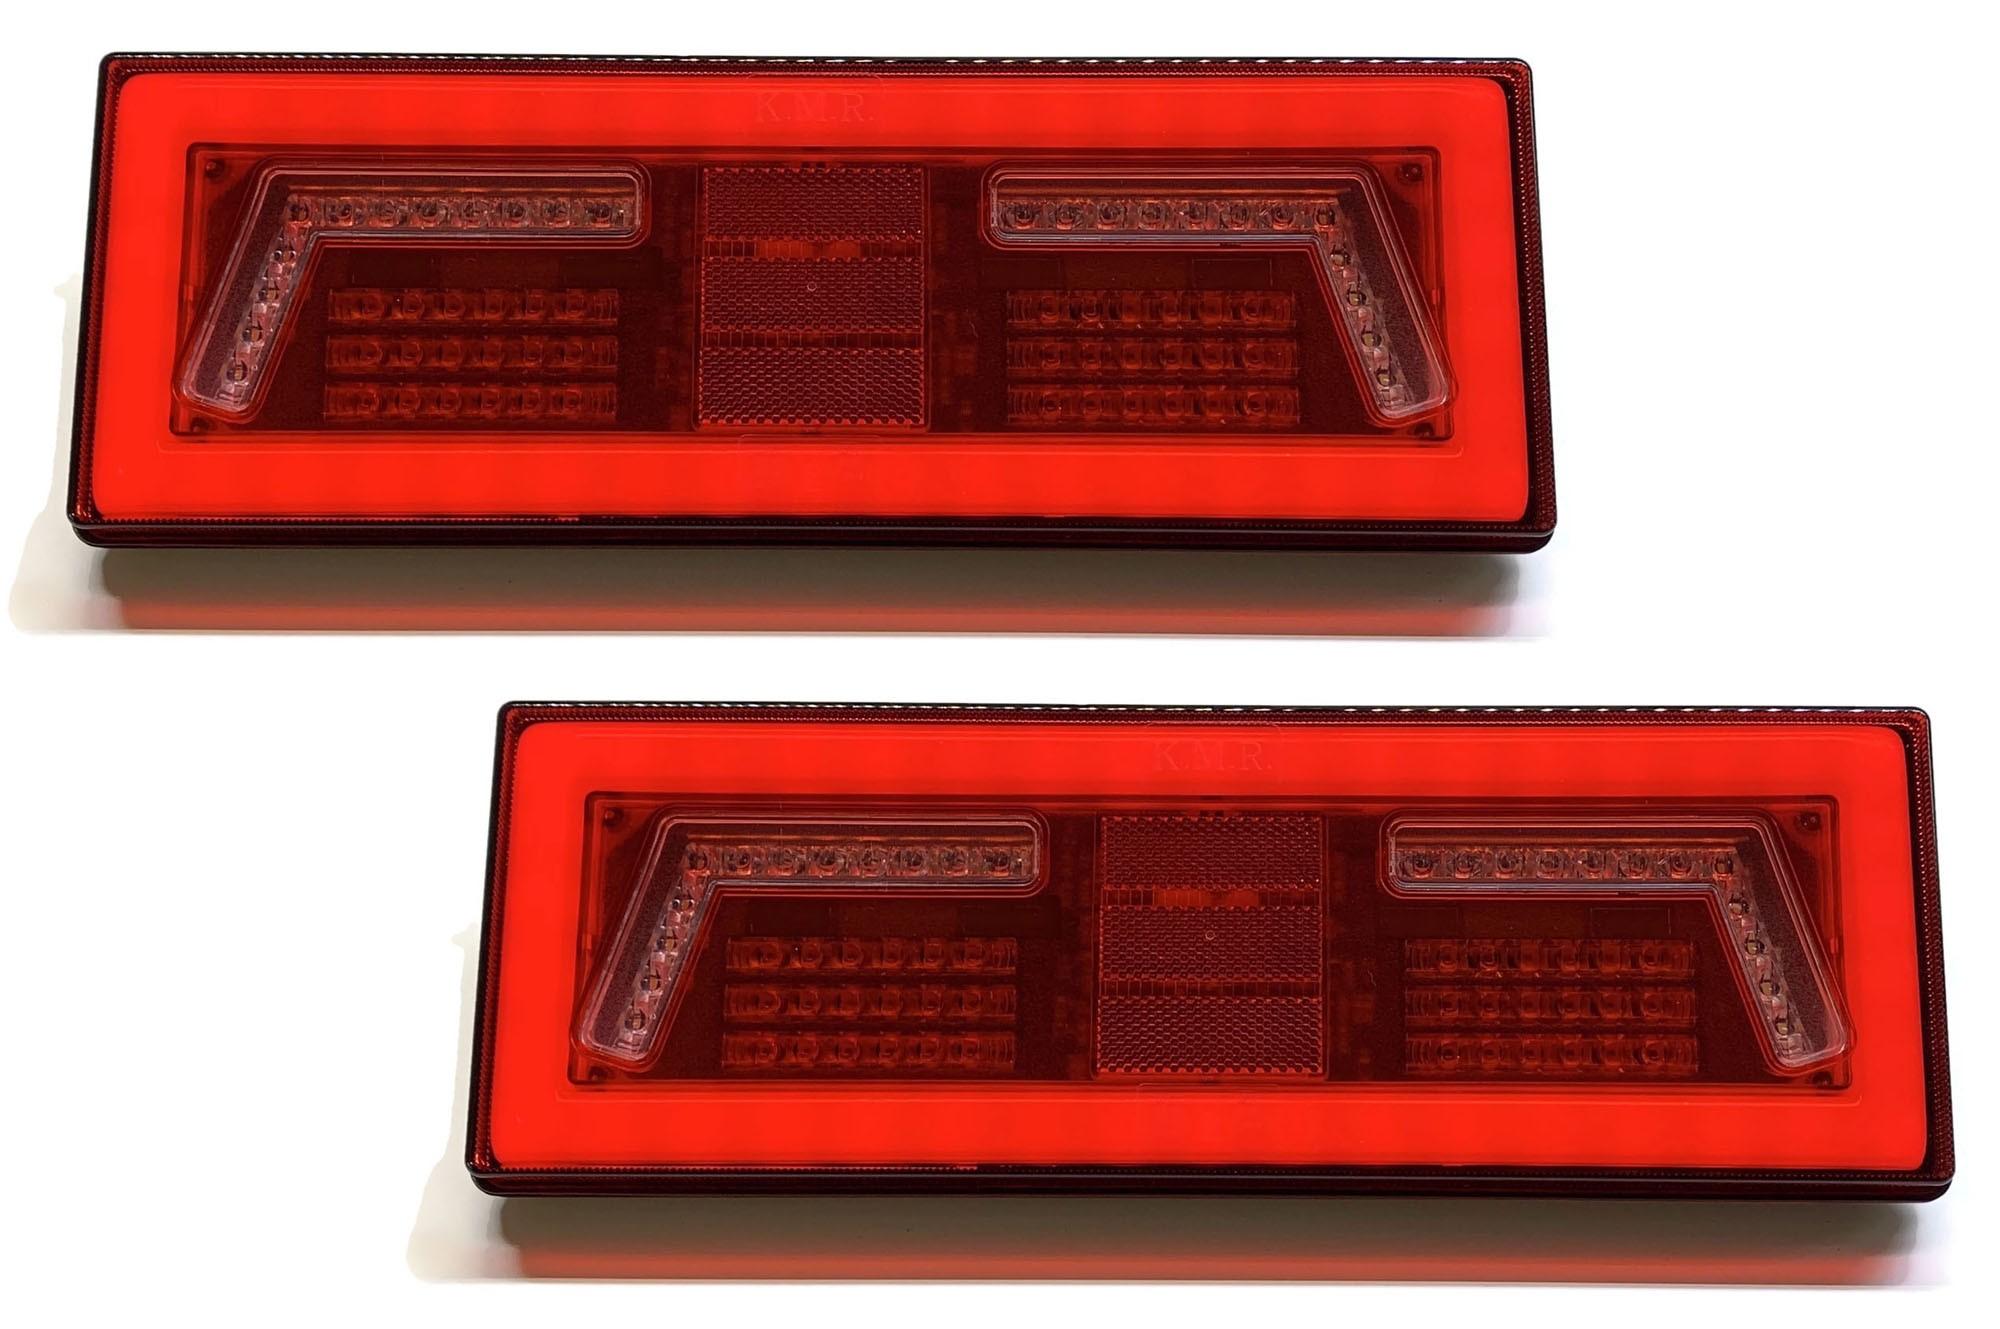 2X LAMPA LED TYLNA ZESPOLONA NEON TIR KMR 12V 24V